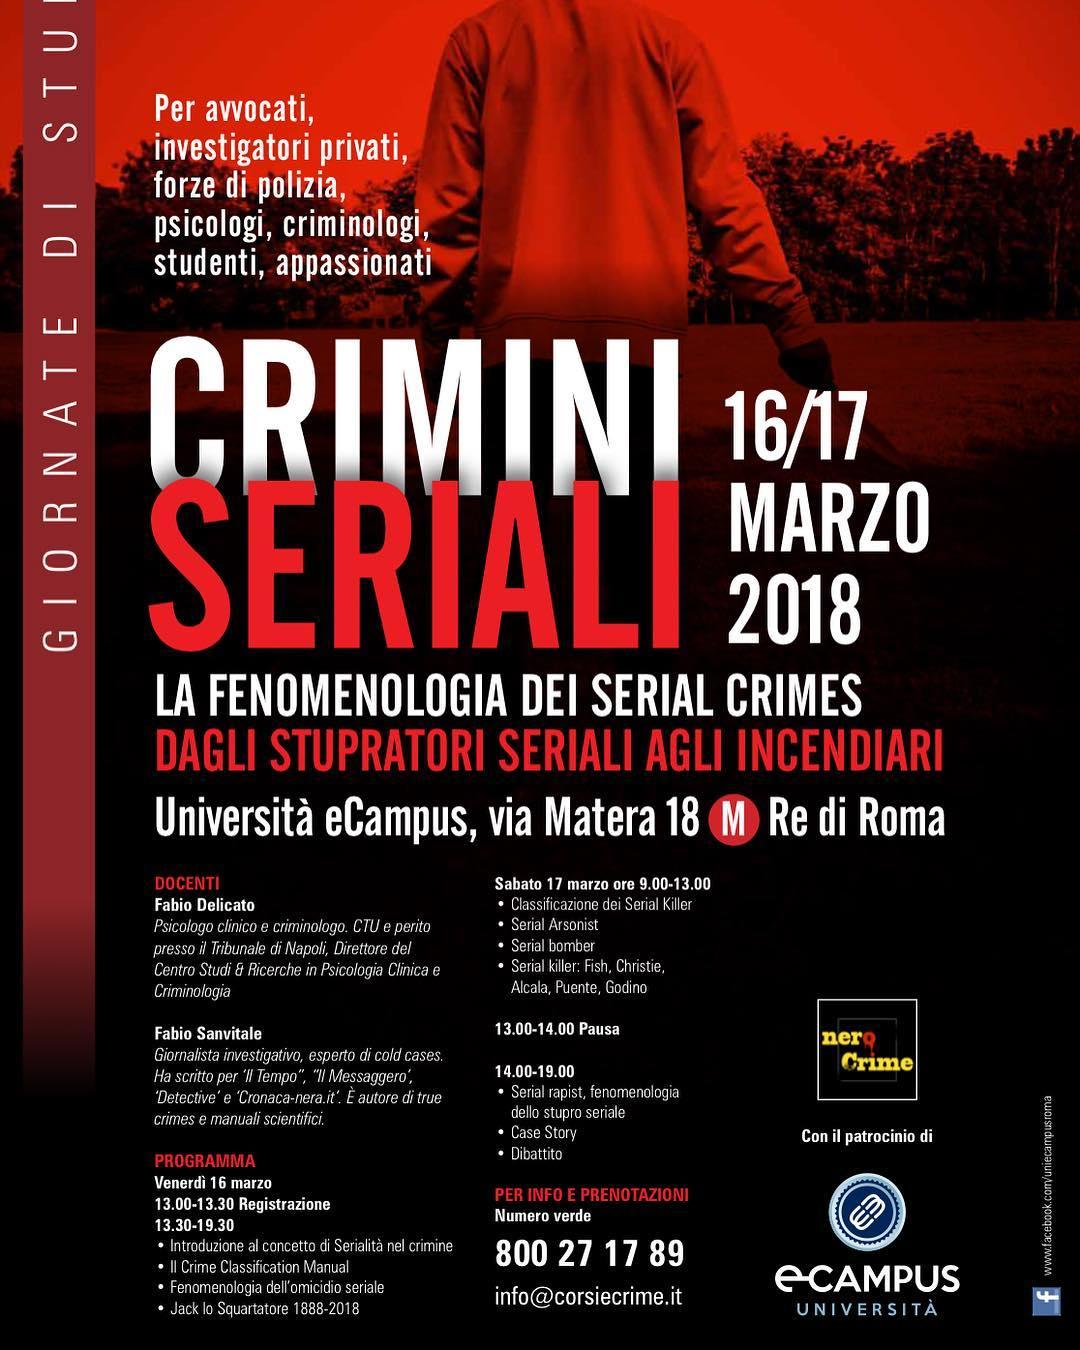 Crimini seriali